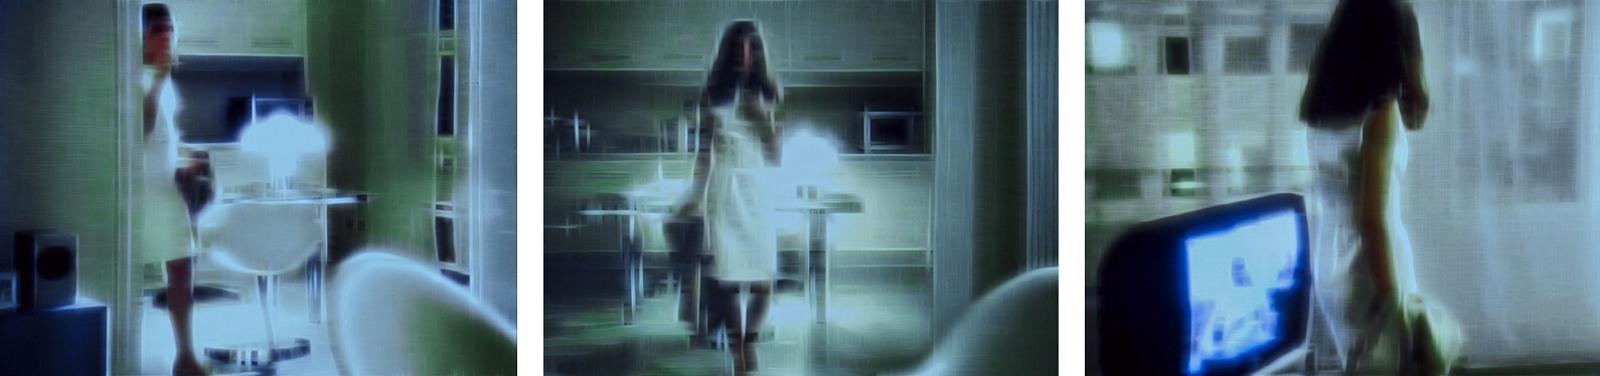 Jean Francois Lepetit - Romance X II - Andrej Barov